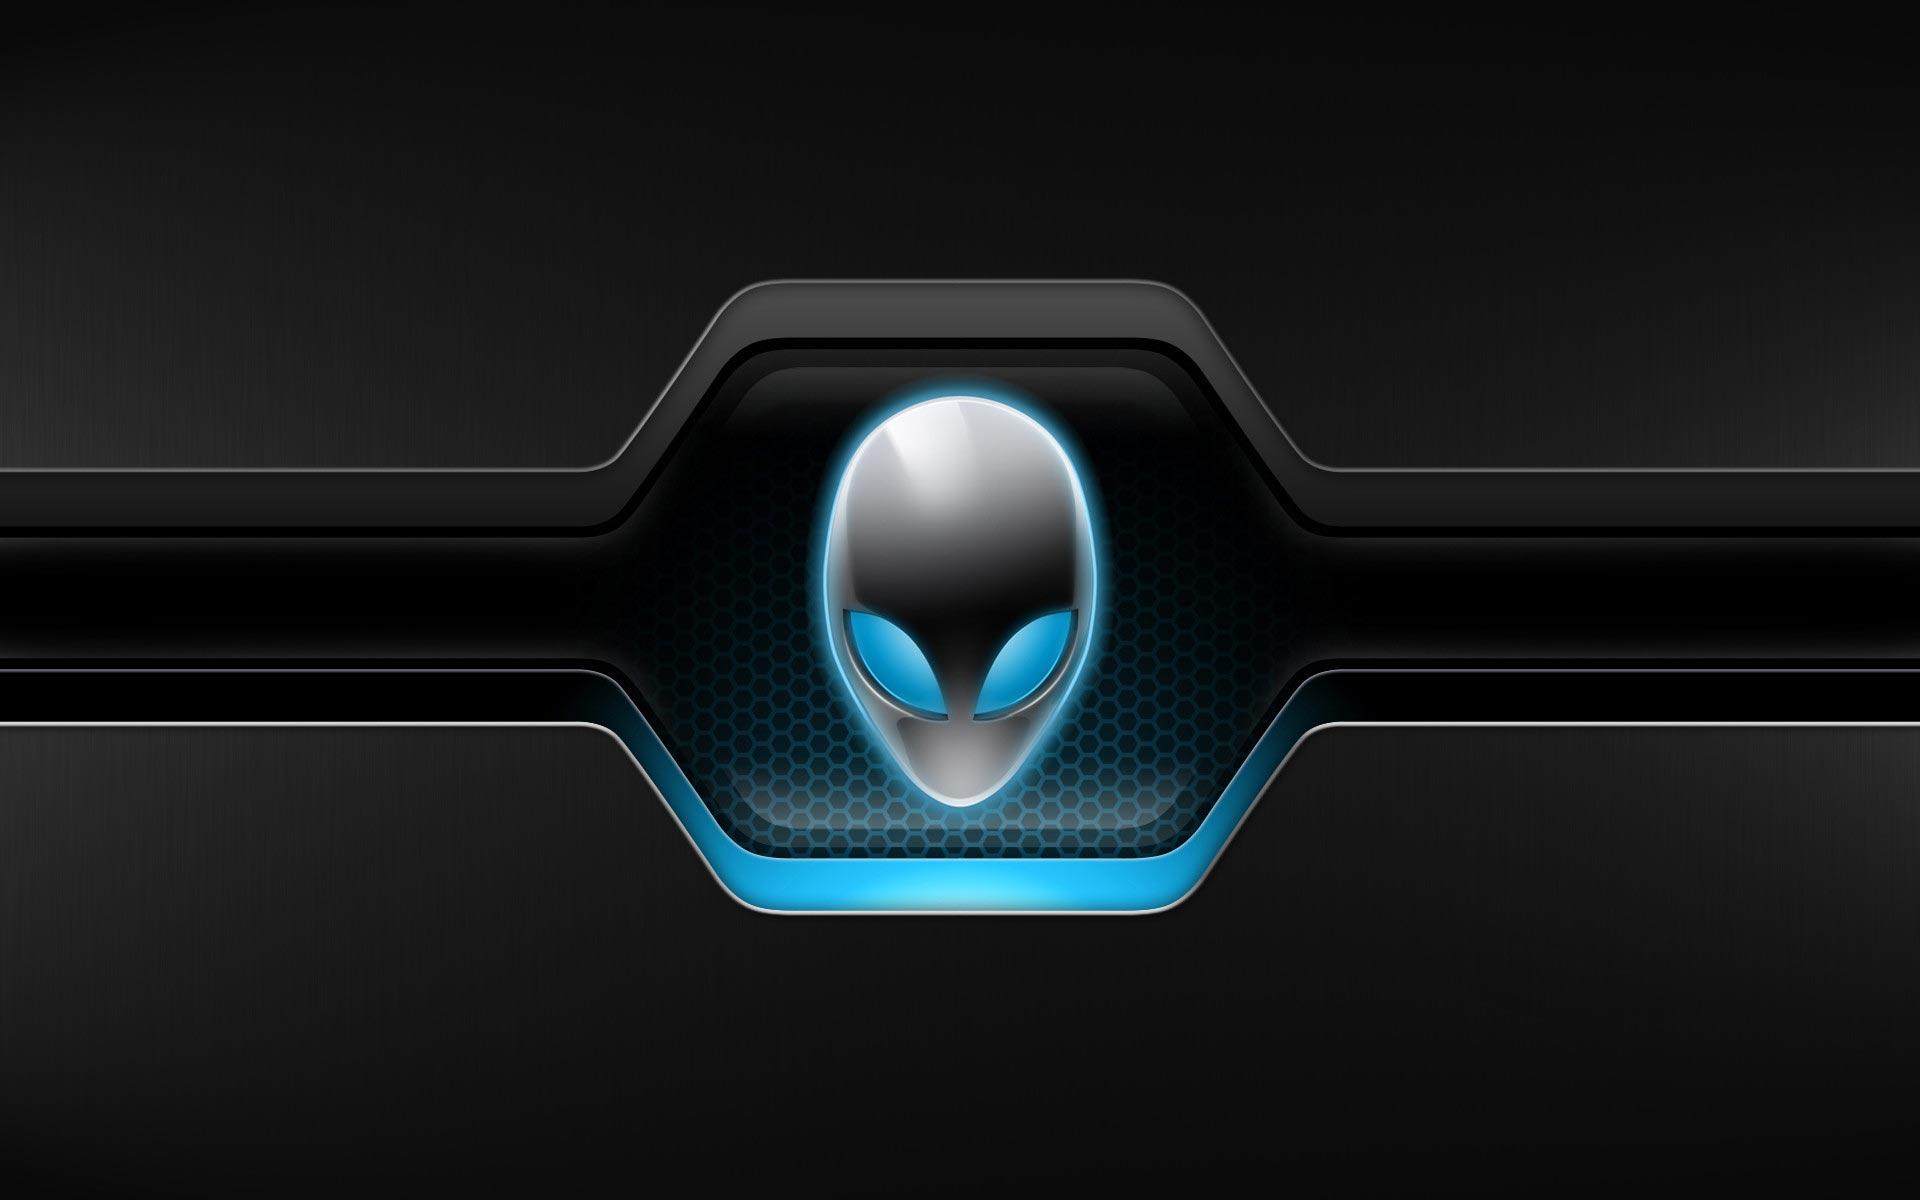 Lieblings Alienware Wallpapers HD - Wallpaper Cave &DR_49